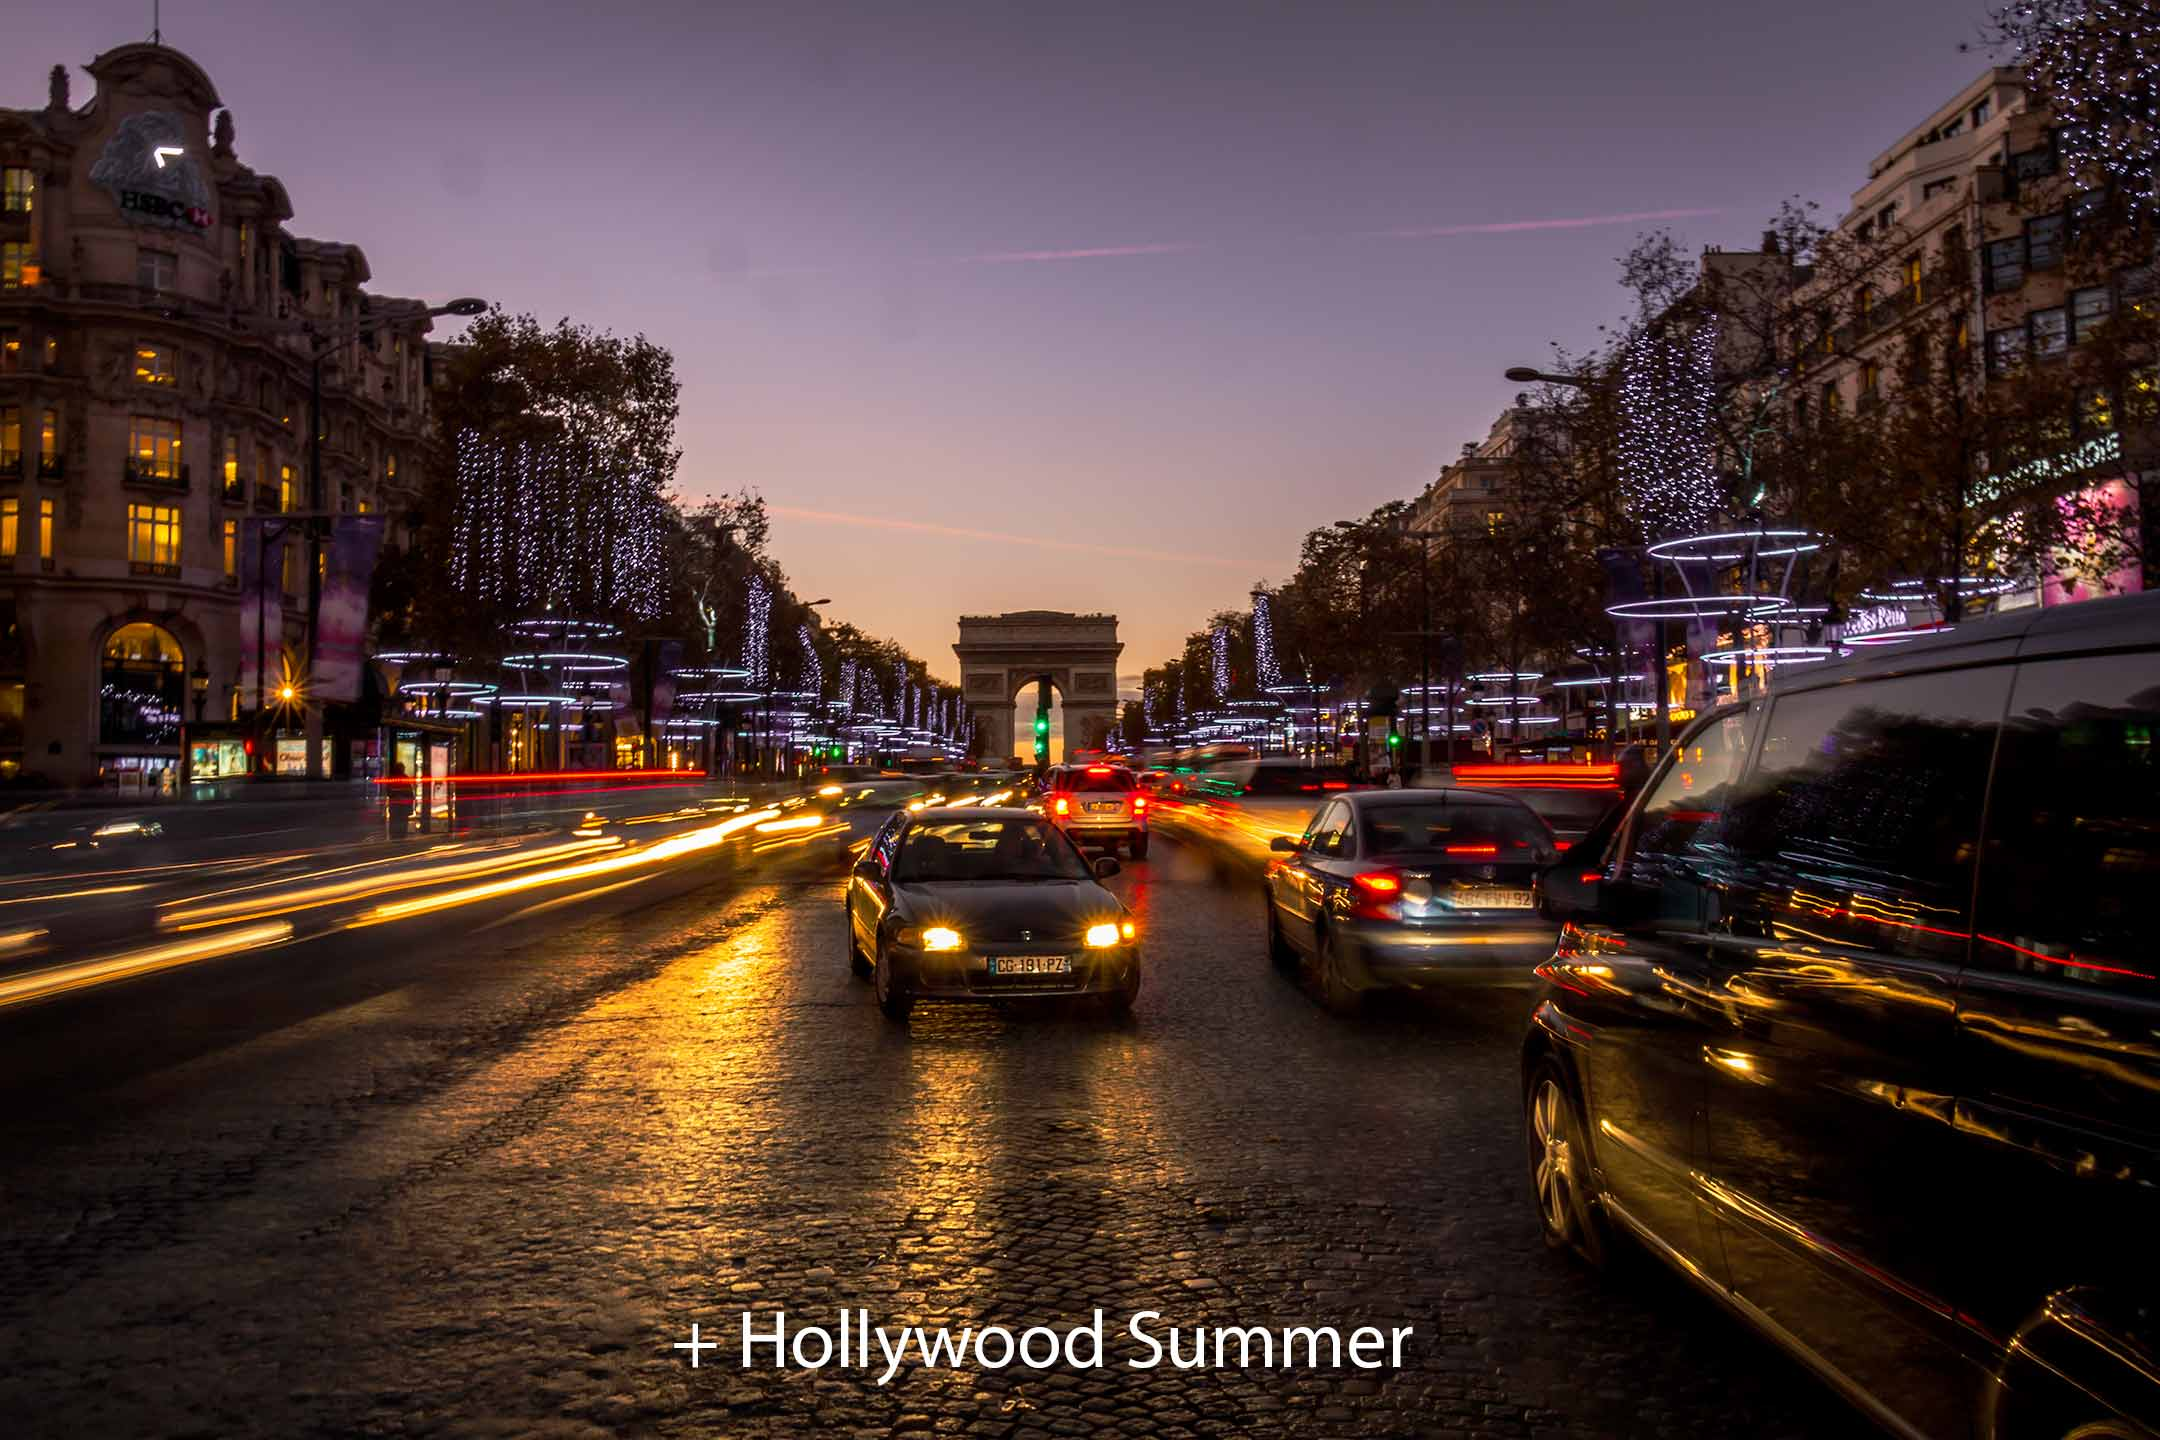 Hollywood Summer 1.jpg